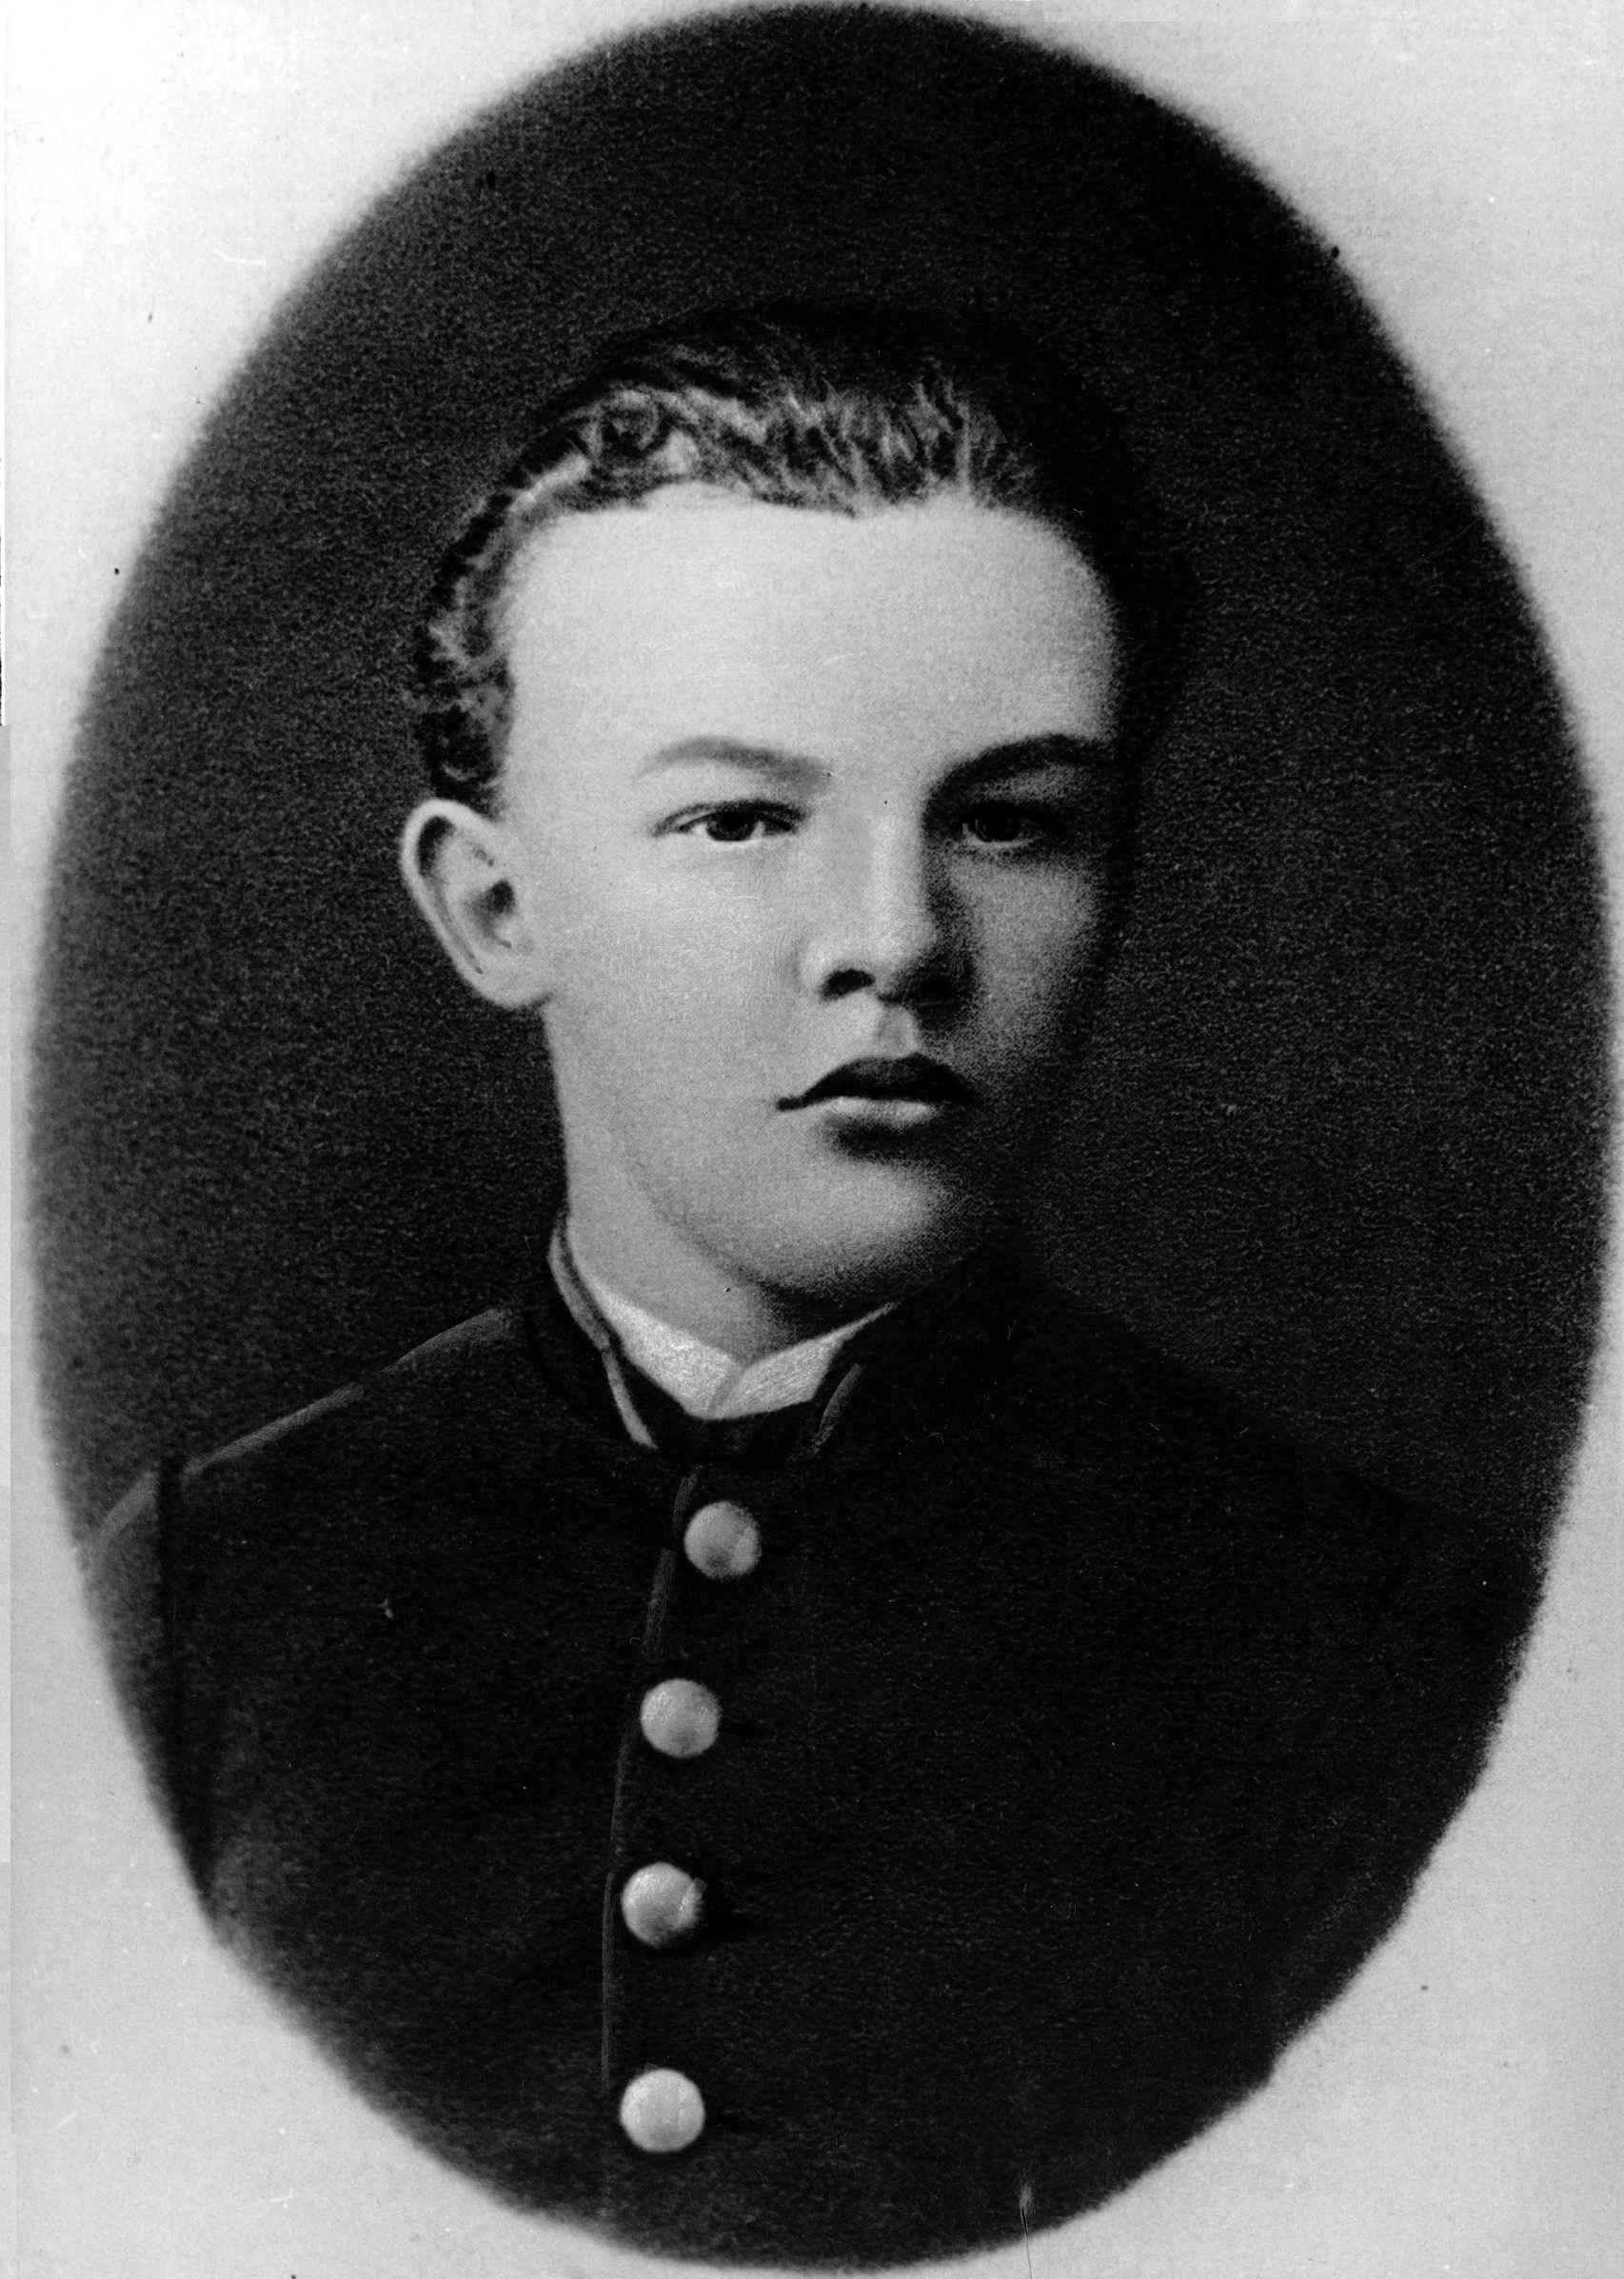 Joven Lenin.